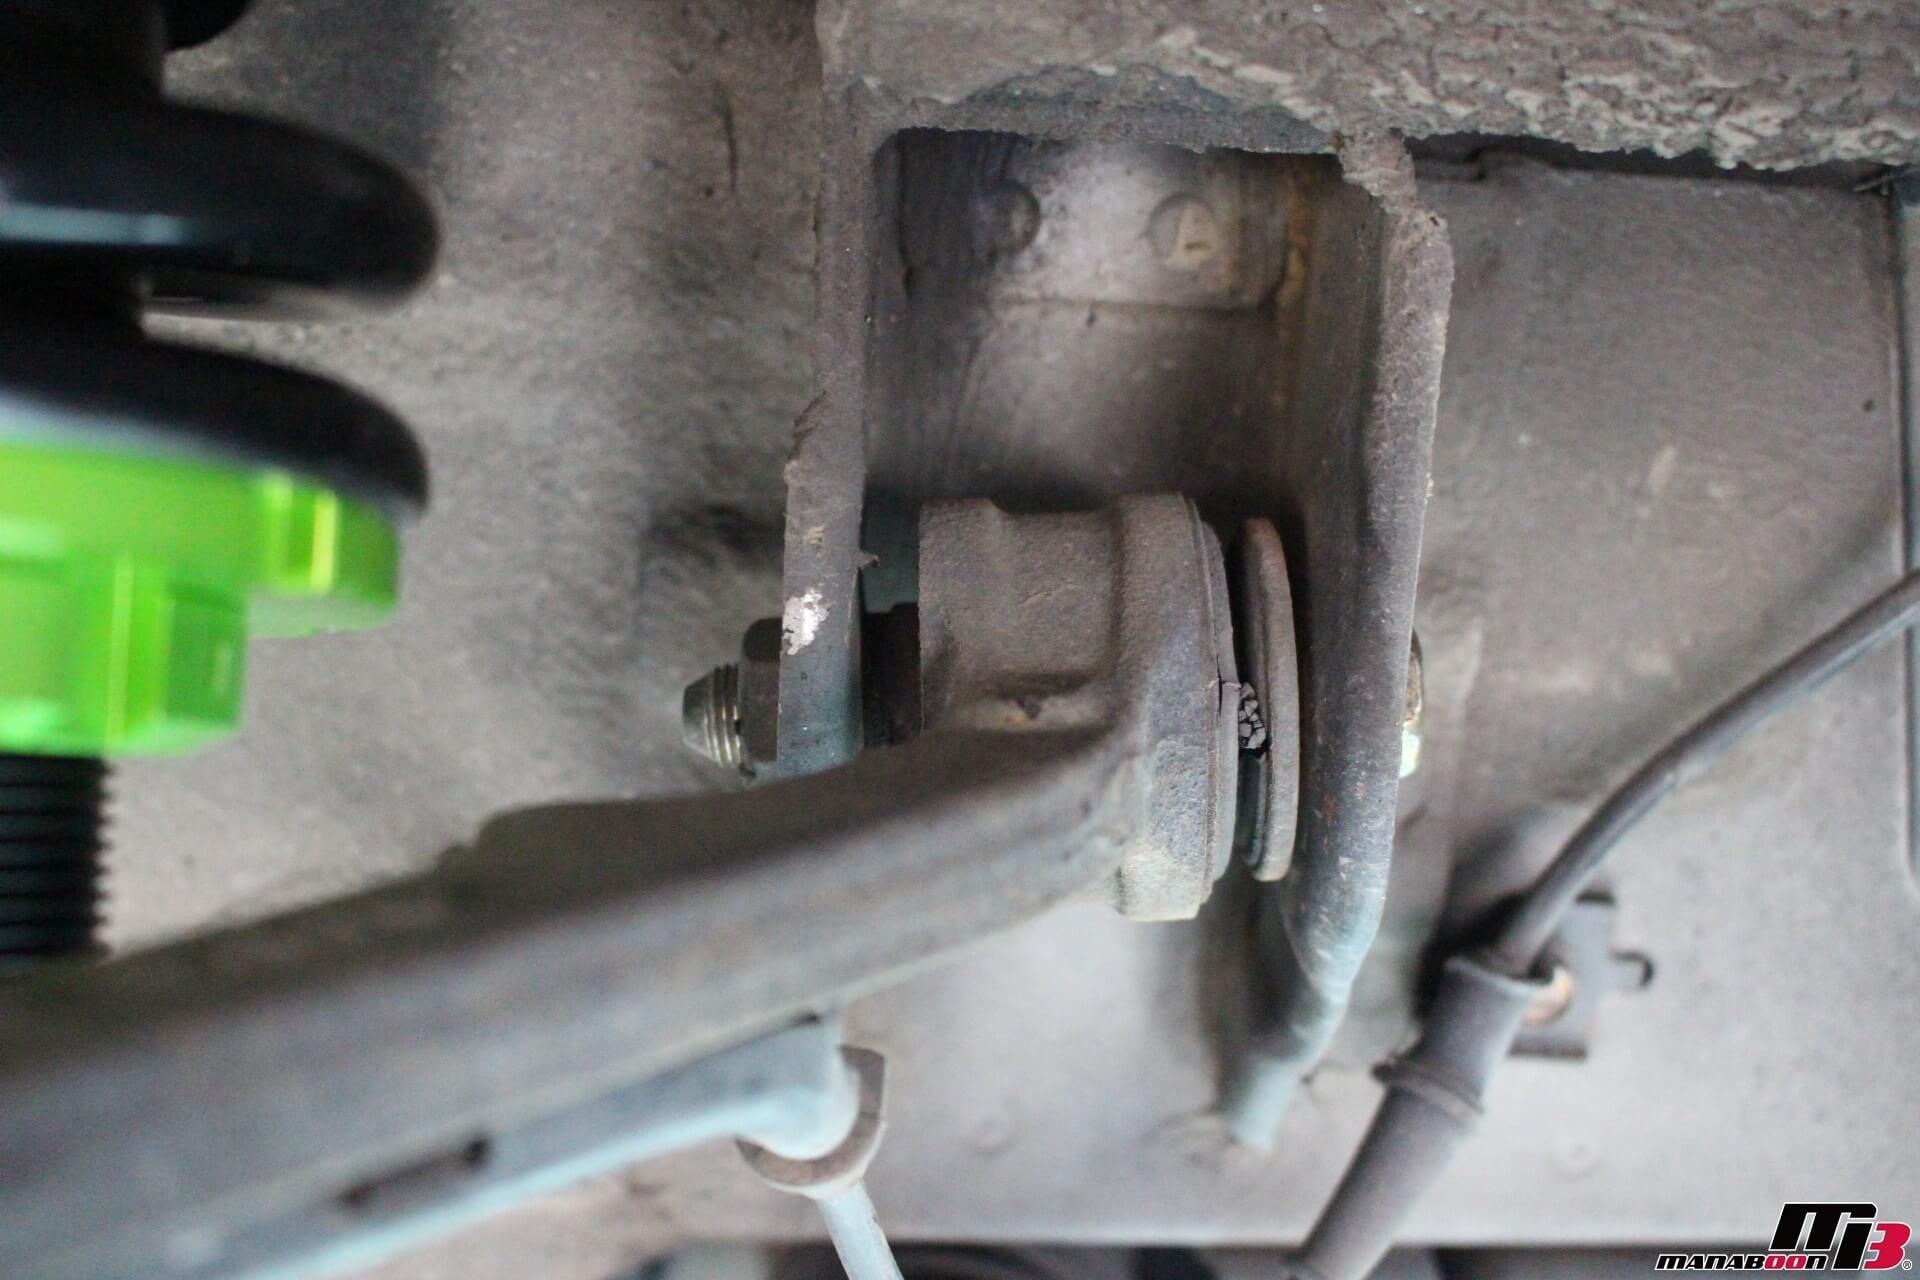 S2000(AP1)フロントアッパーアーム付け根画像